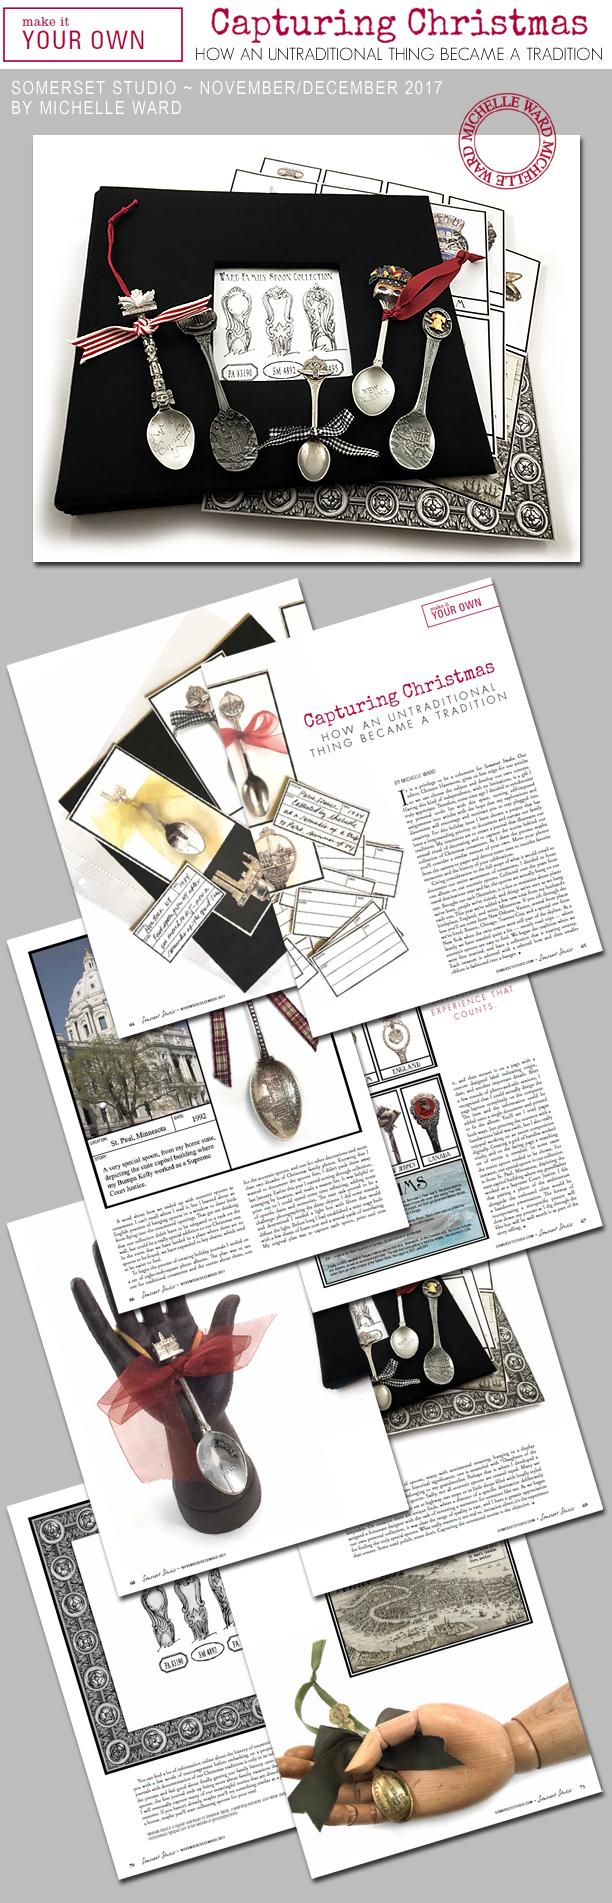 Michelle Ward Somerset Studio NovDec2017 Spoons